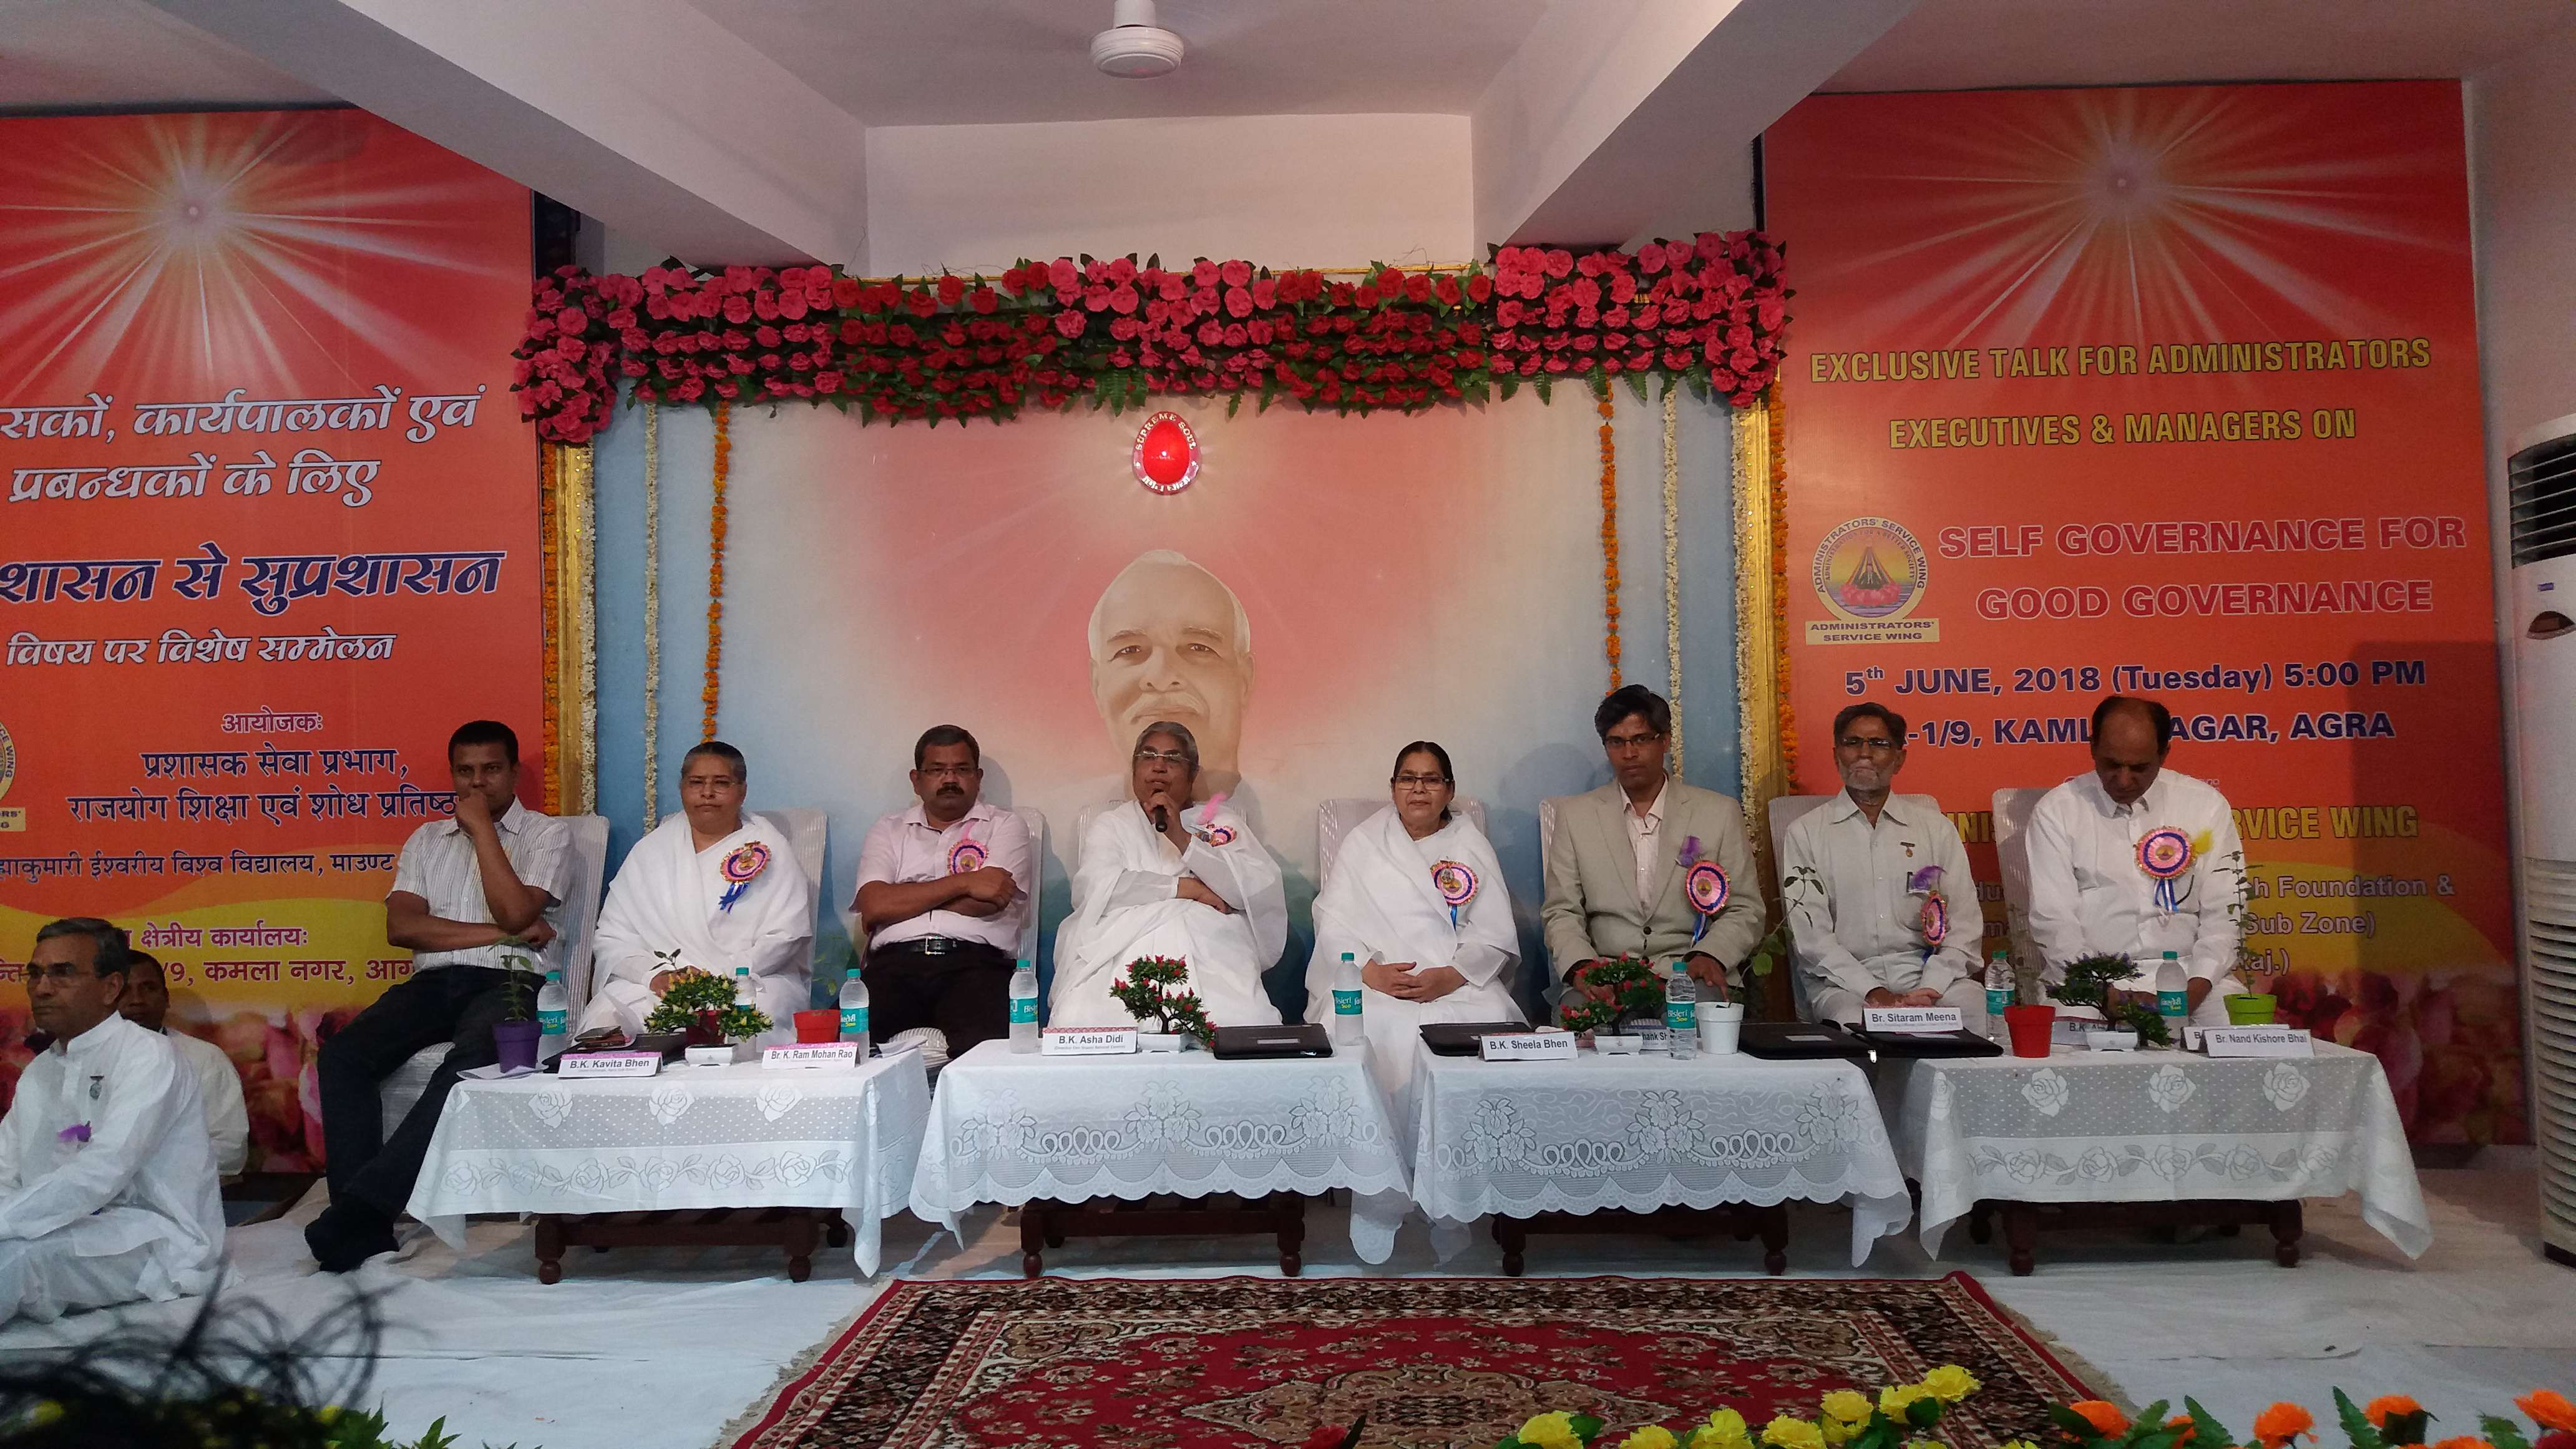 Environment Awareness Program by Brahma Kumaris at Gandhinagar